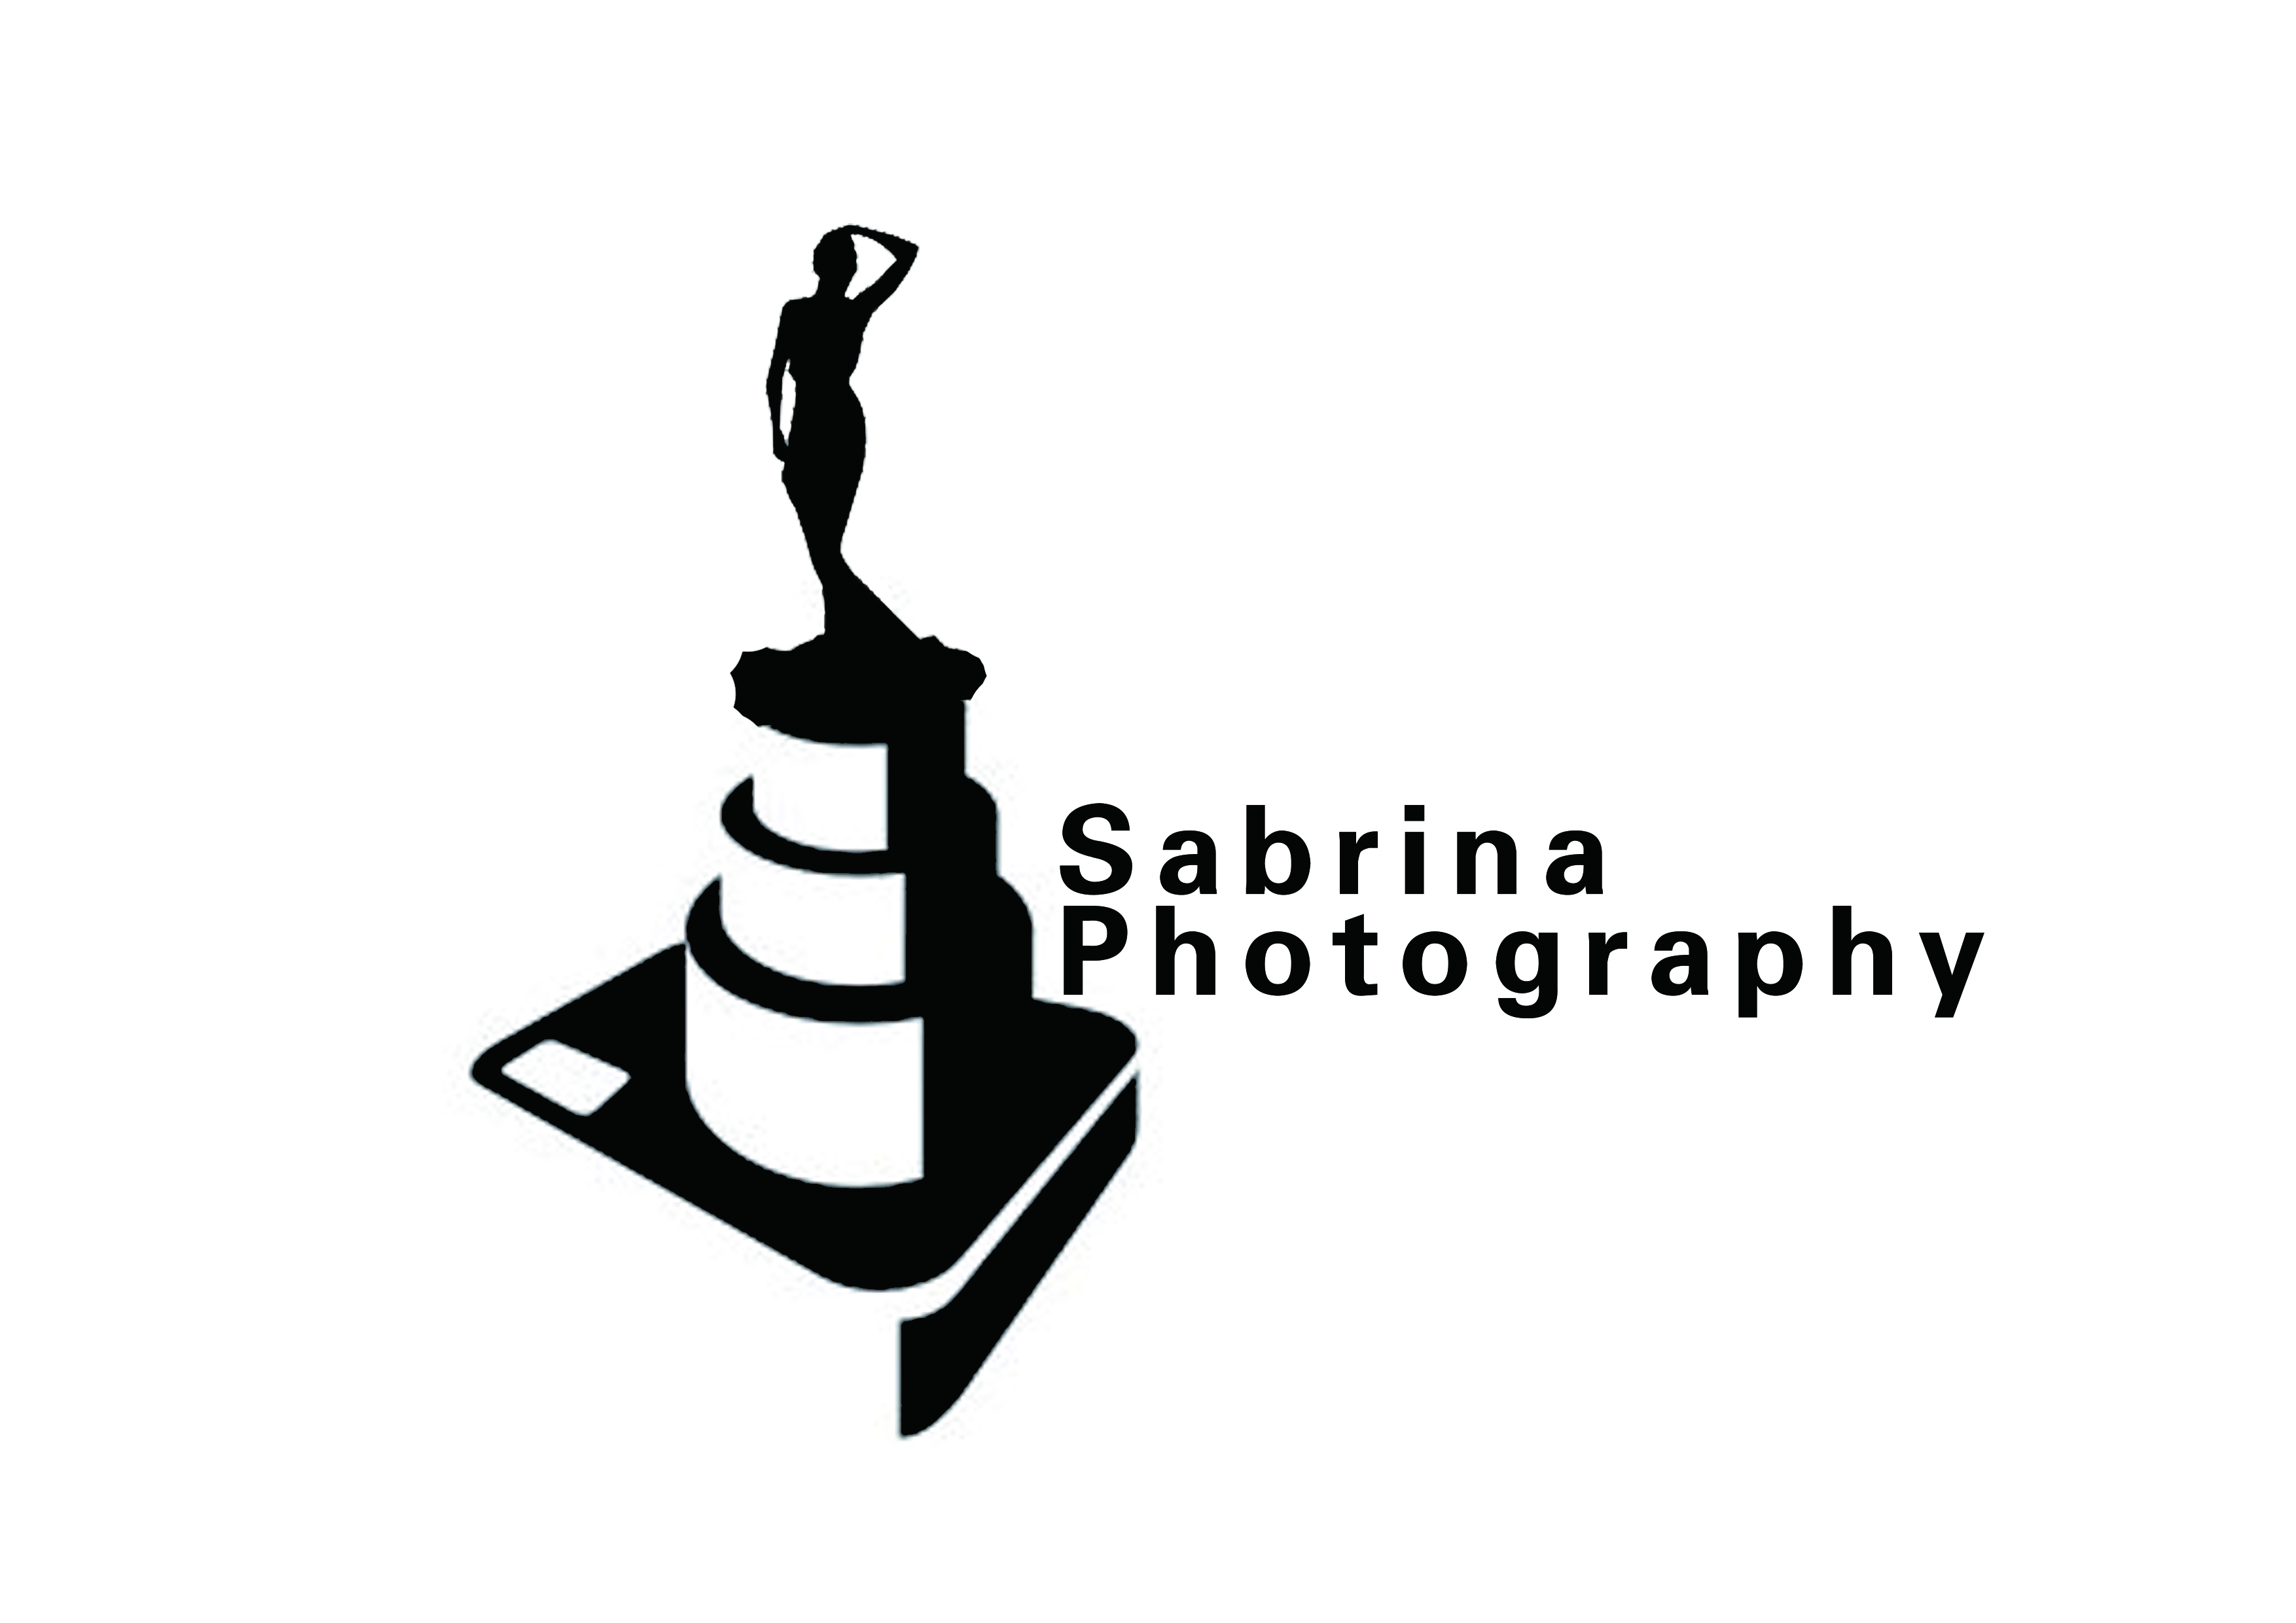 摄影工作室设计logo